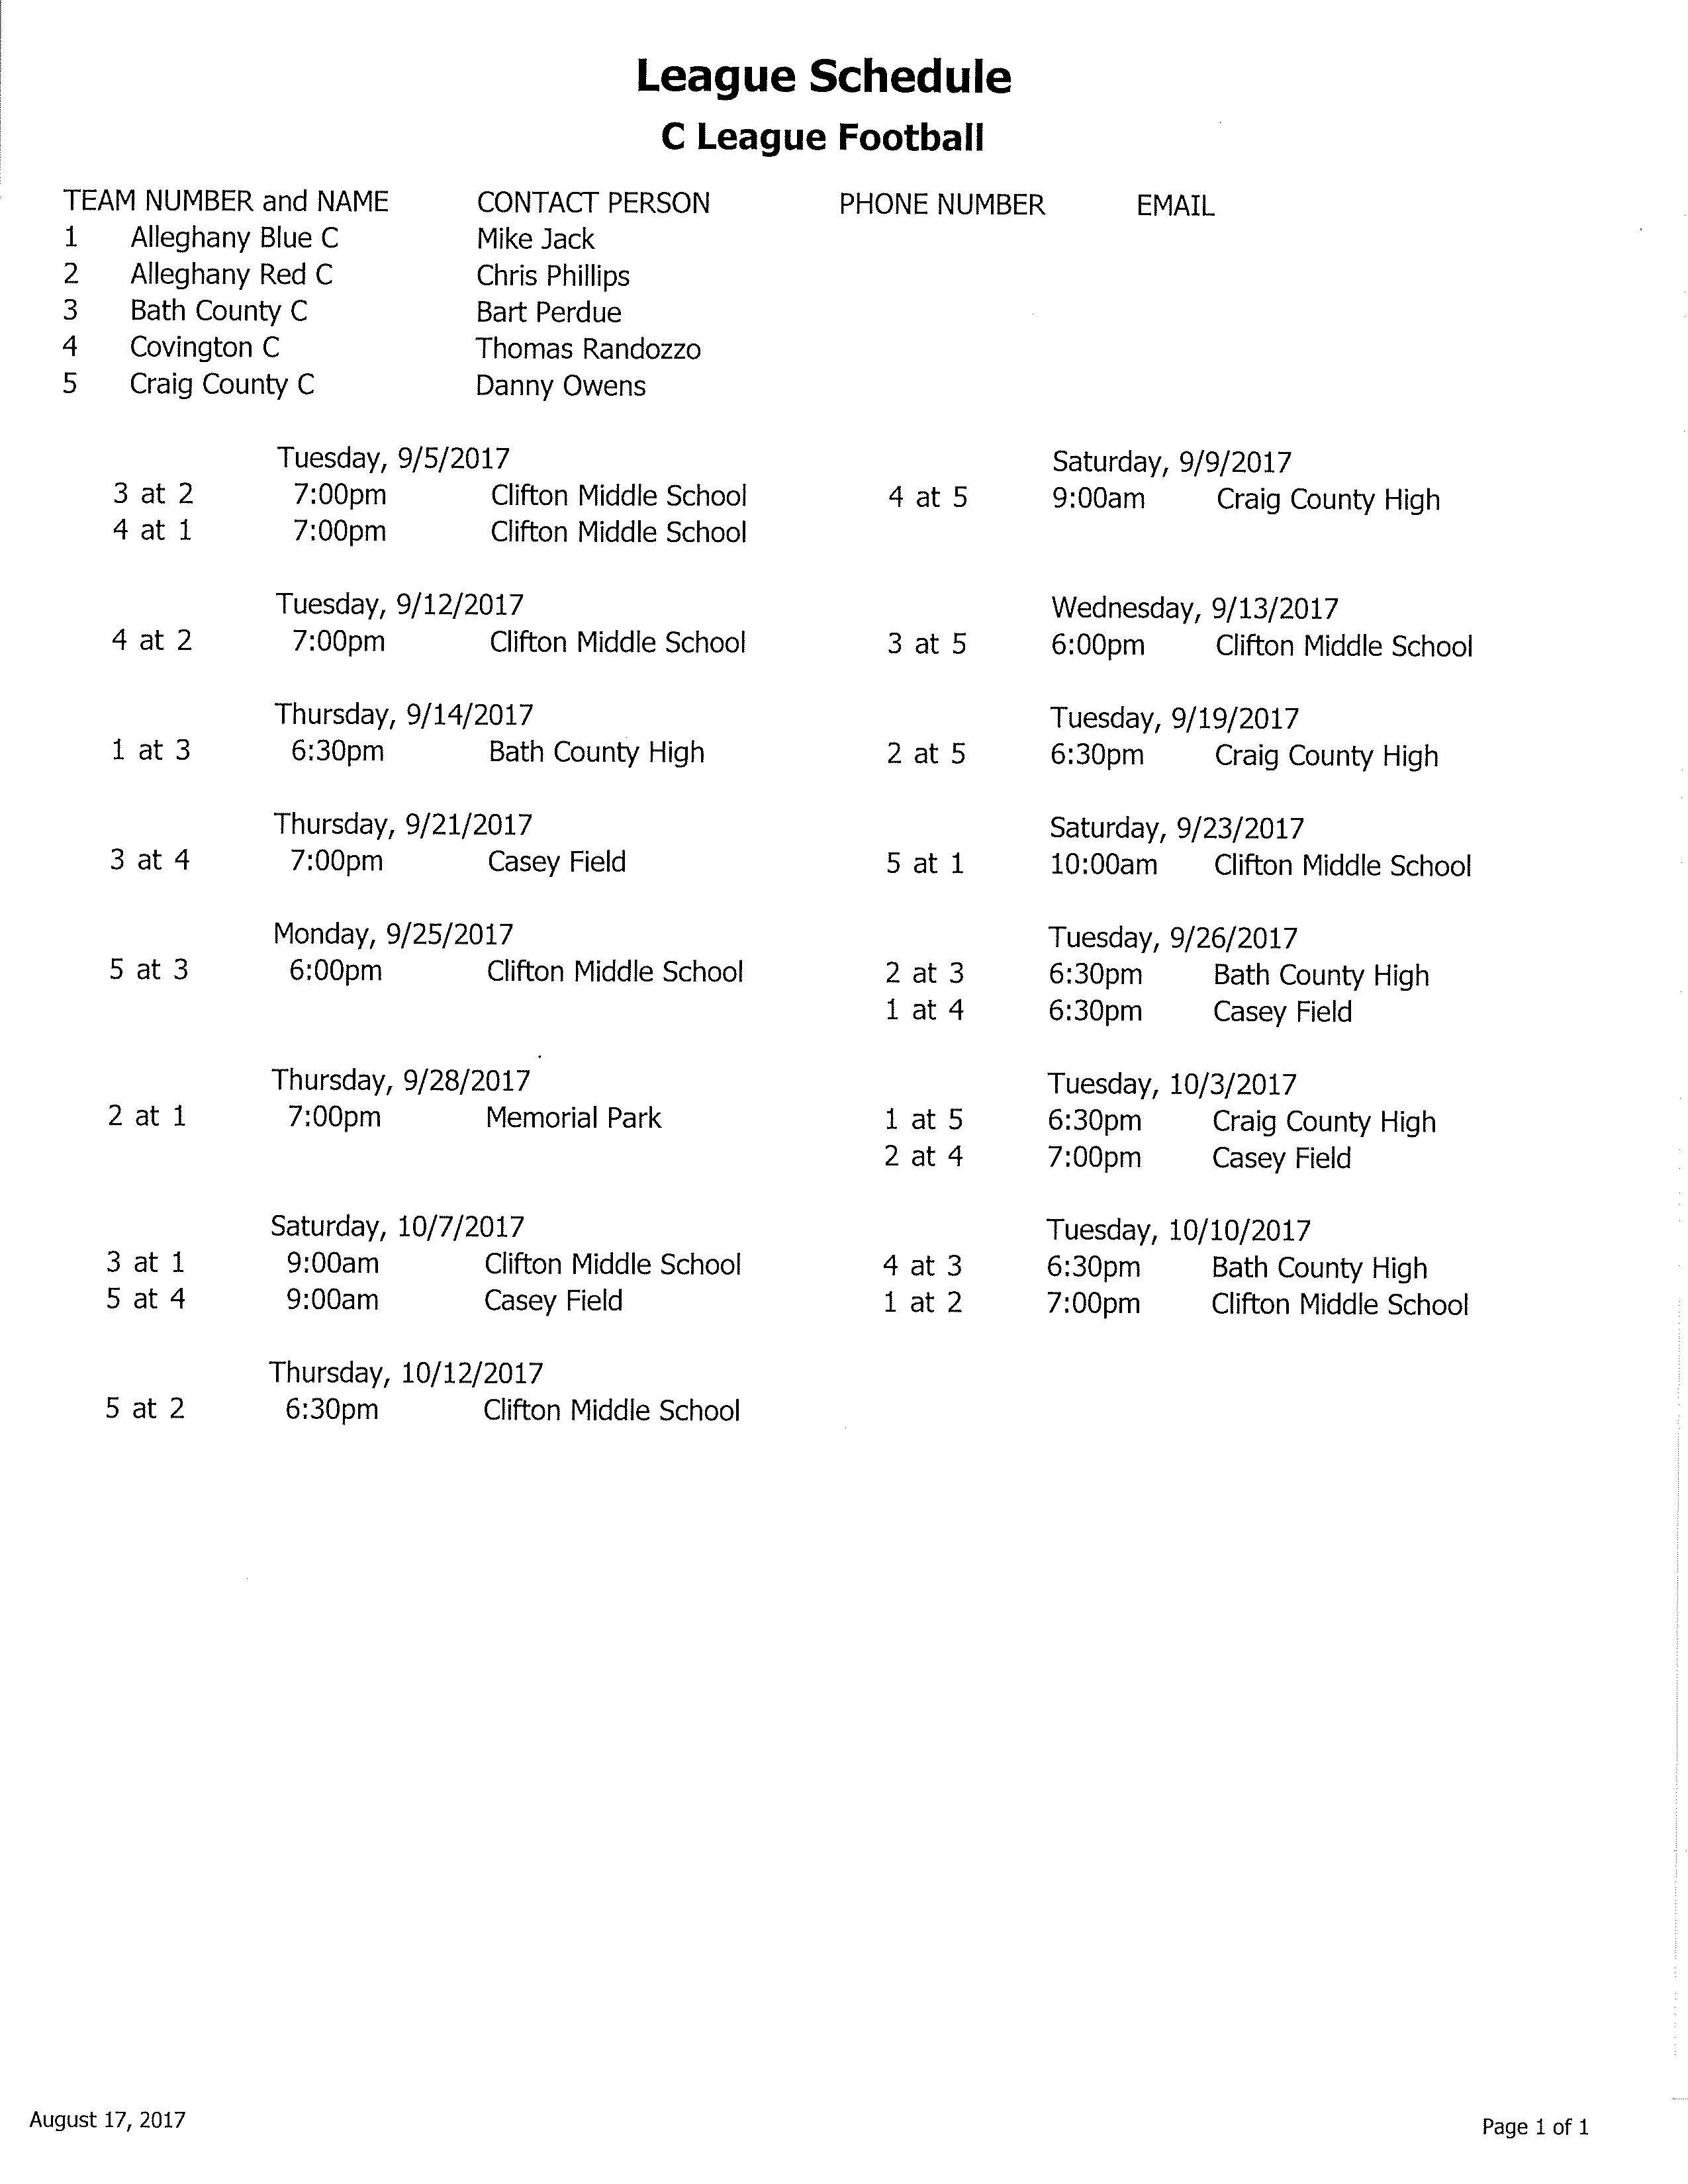 2017 C League Football Schedule